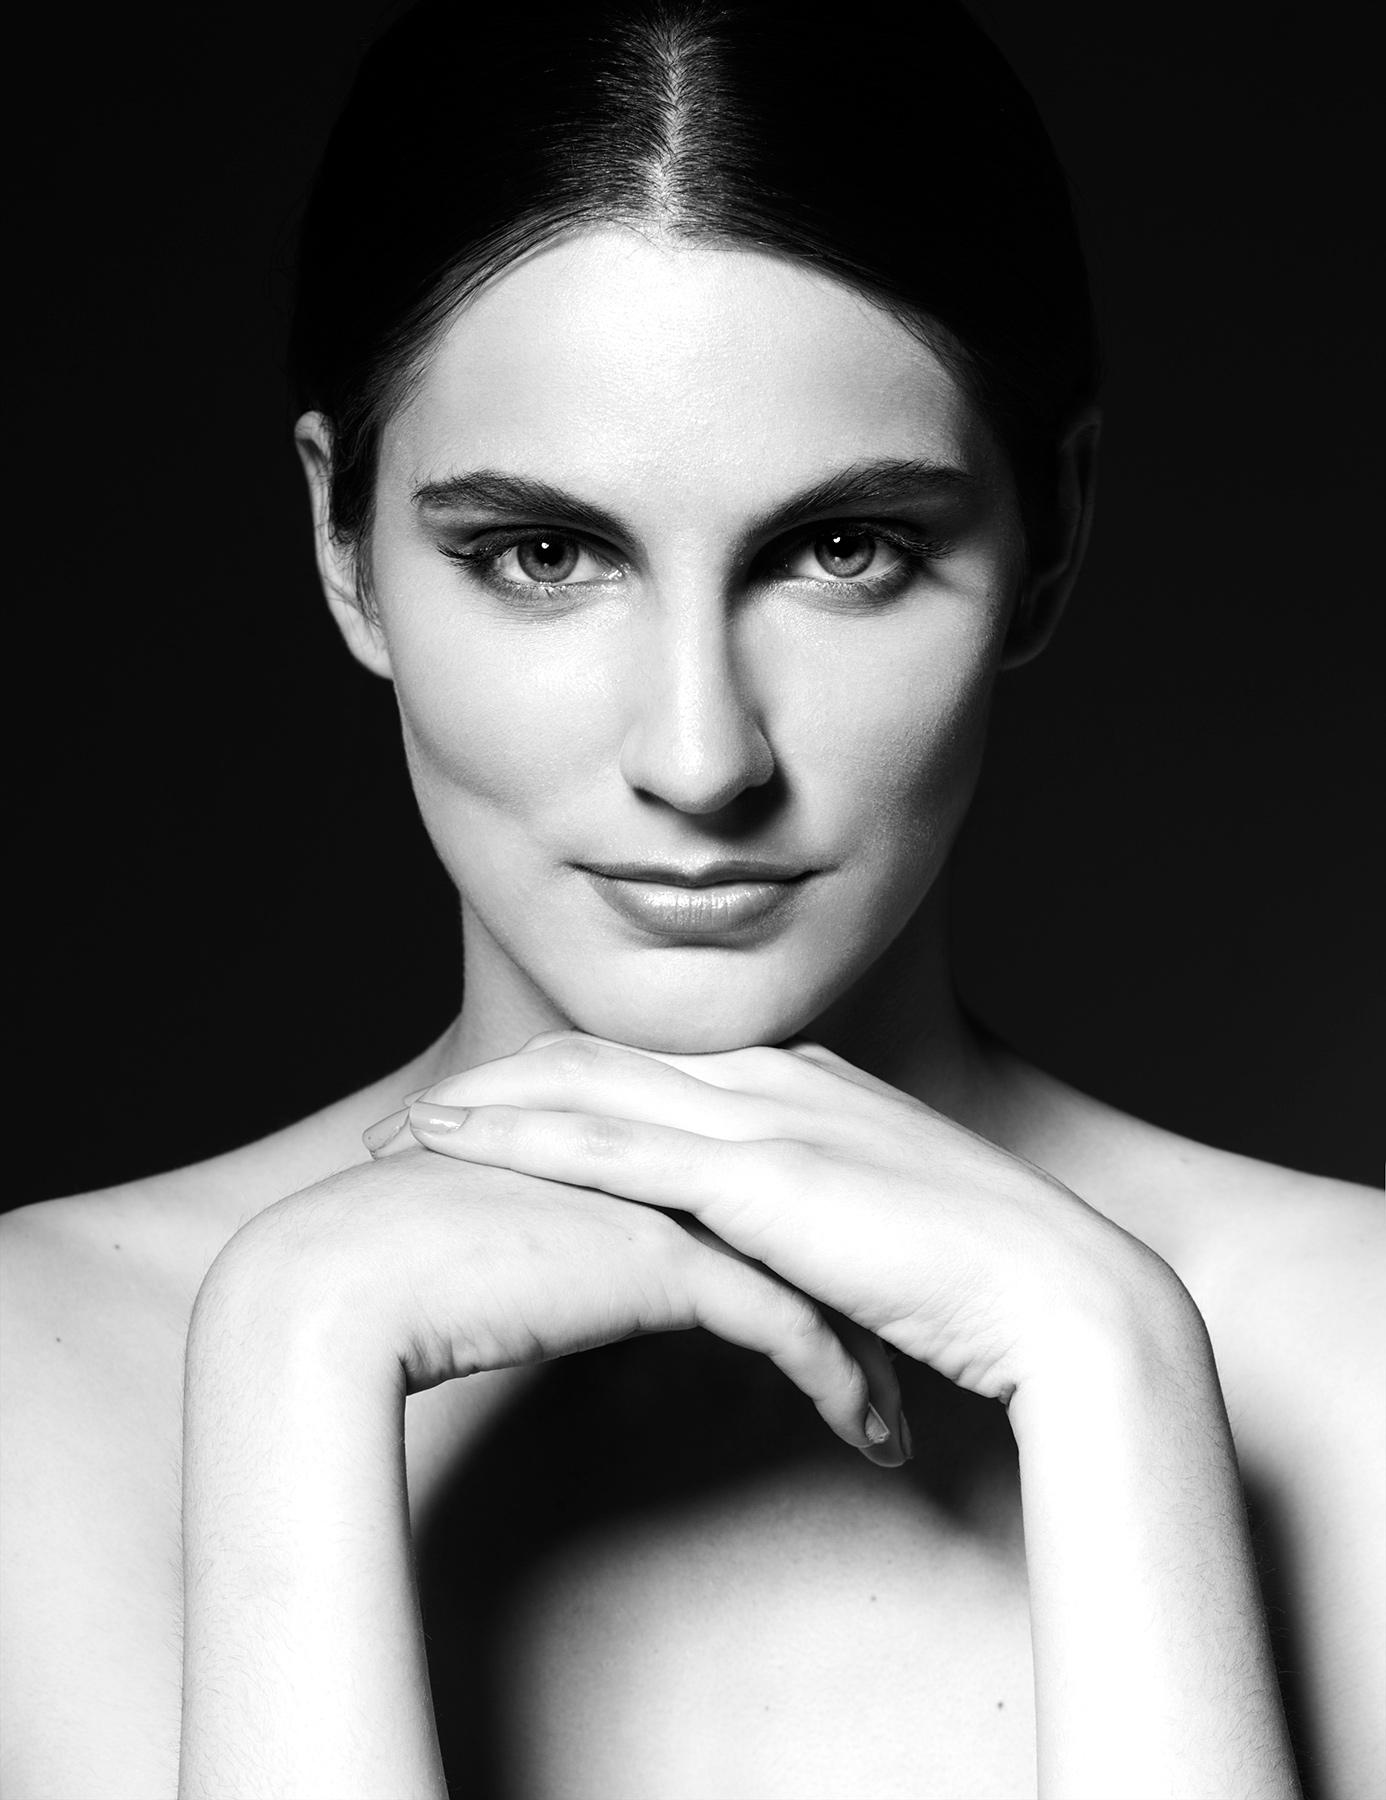 Черно-белый портрет. Анна (FC Models), фотограф: Александр Сакулин